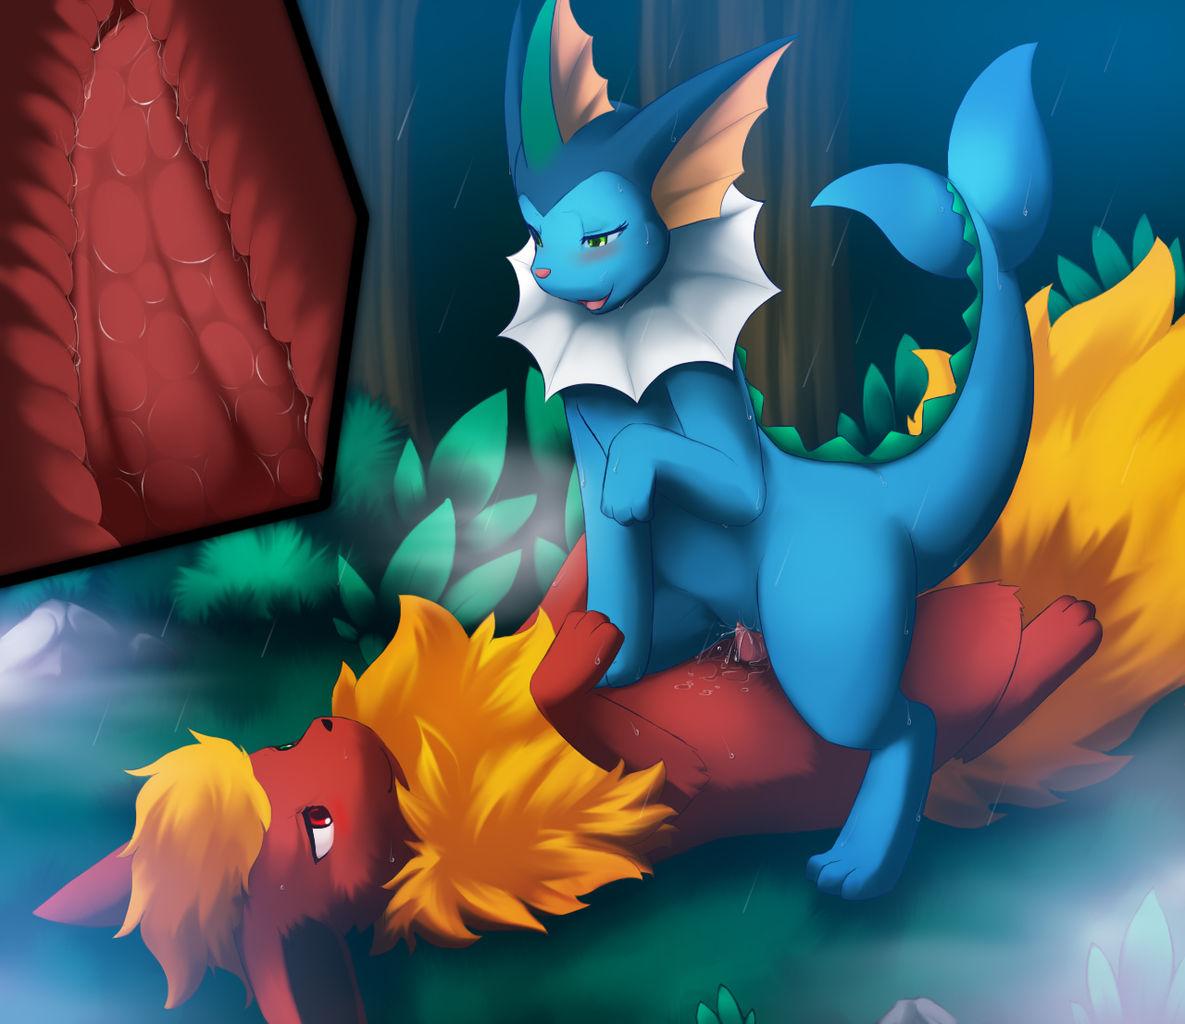 Pokemon snap xxx shemale version - 1 6